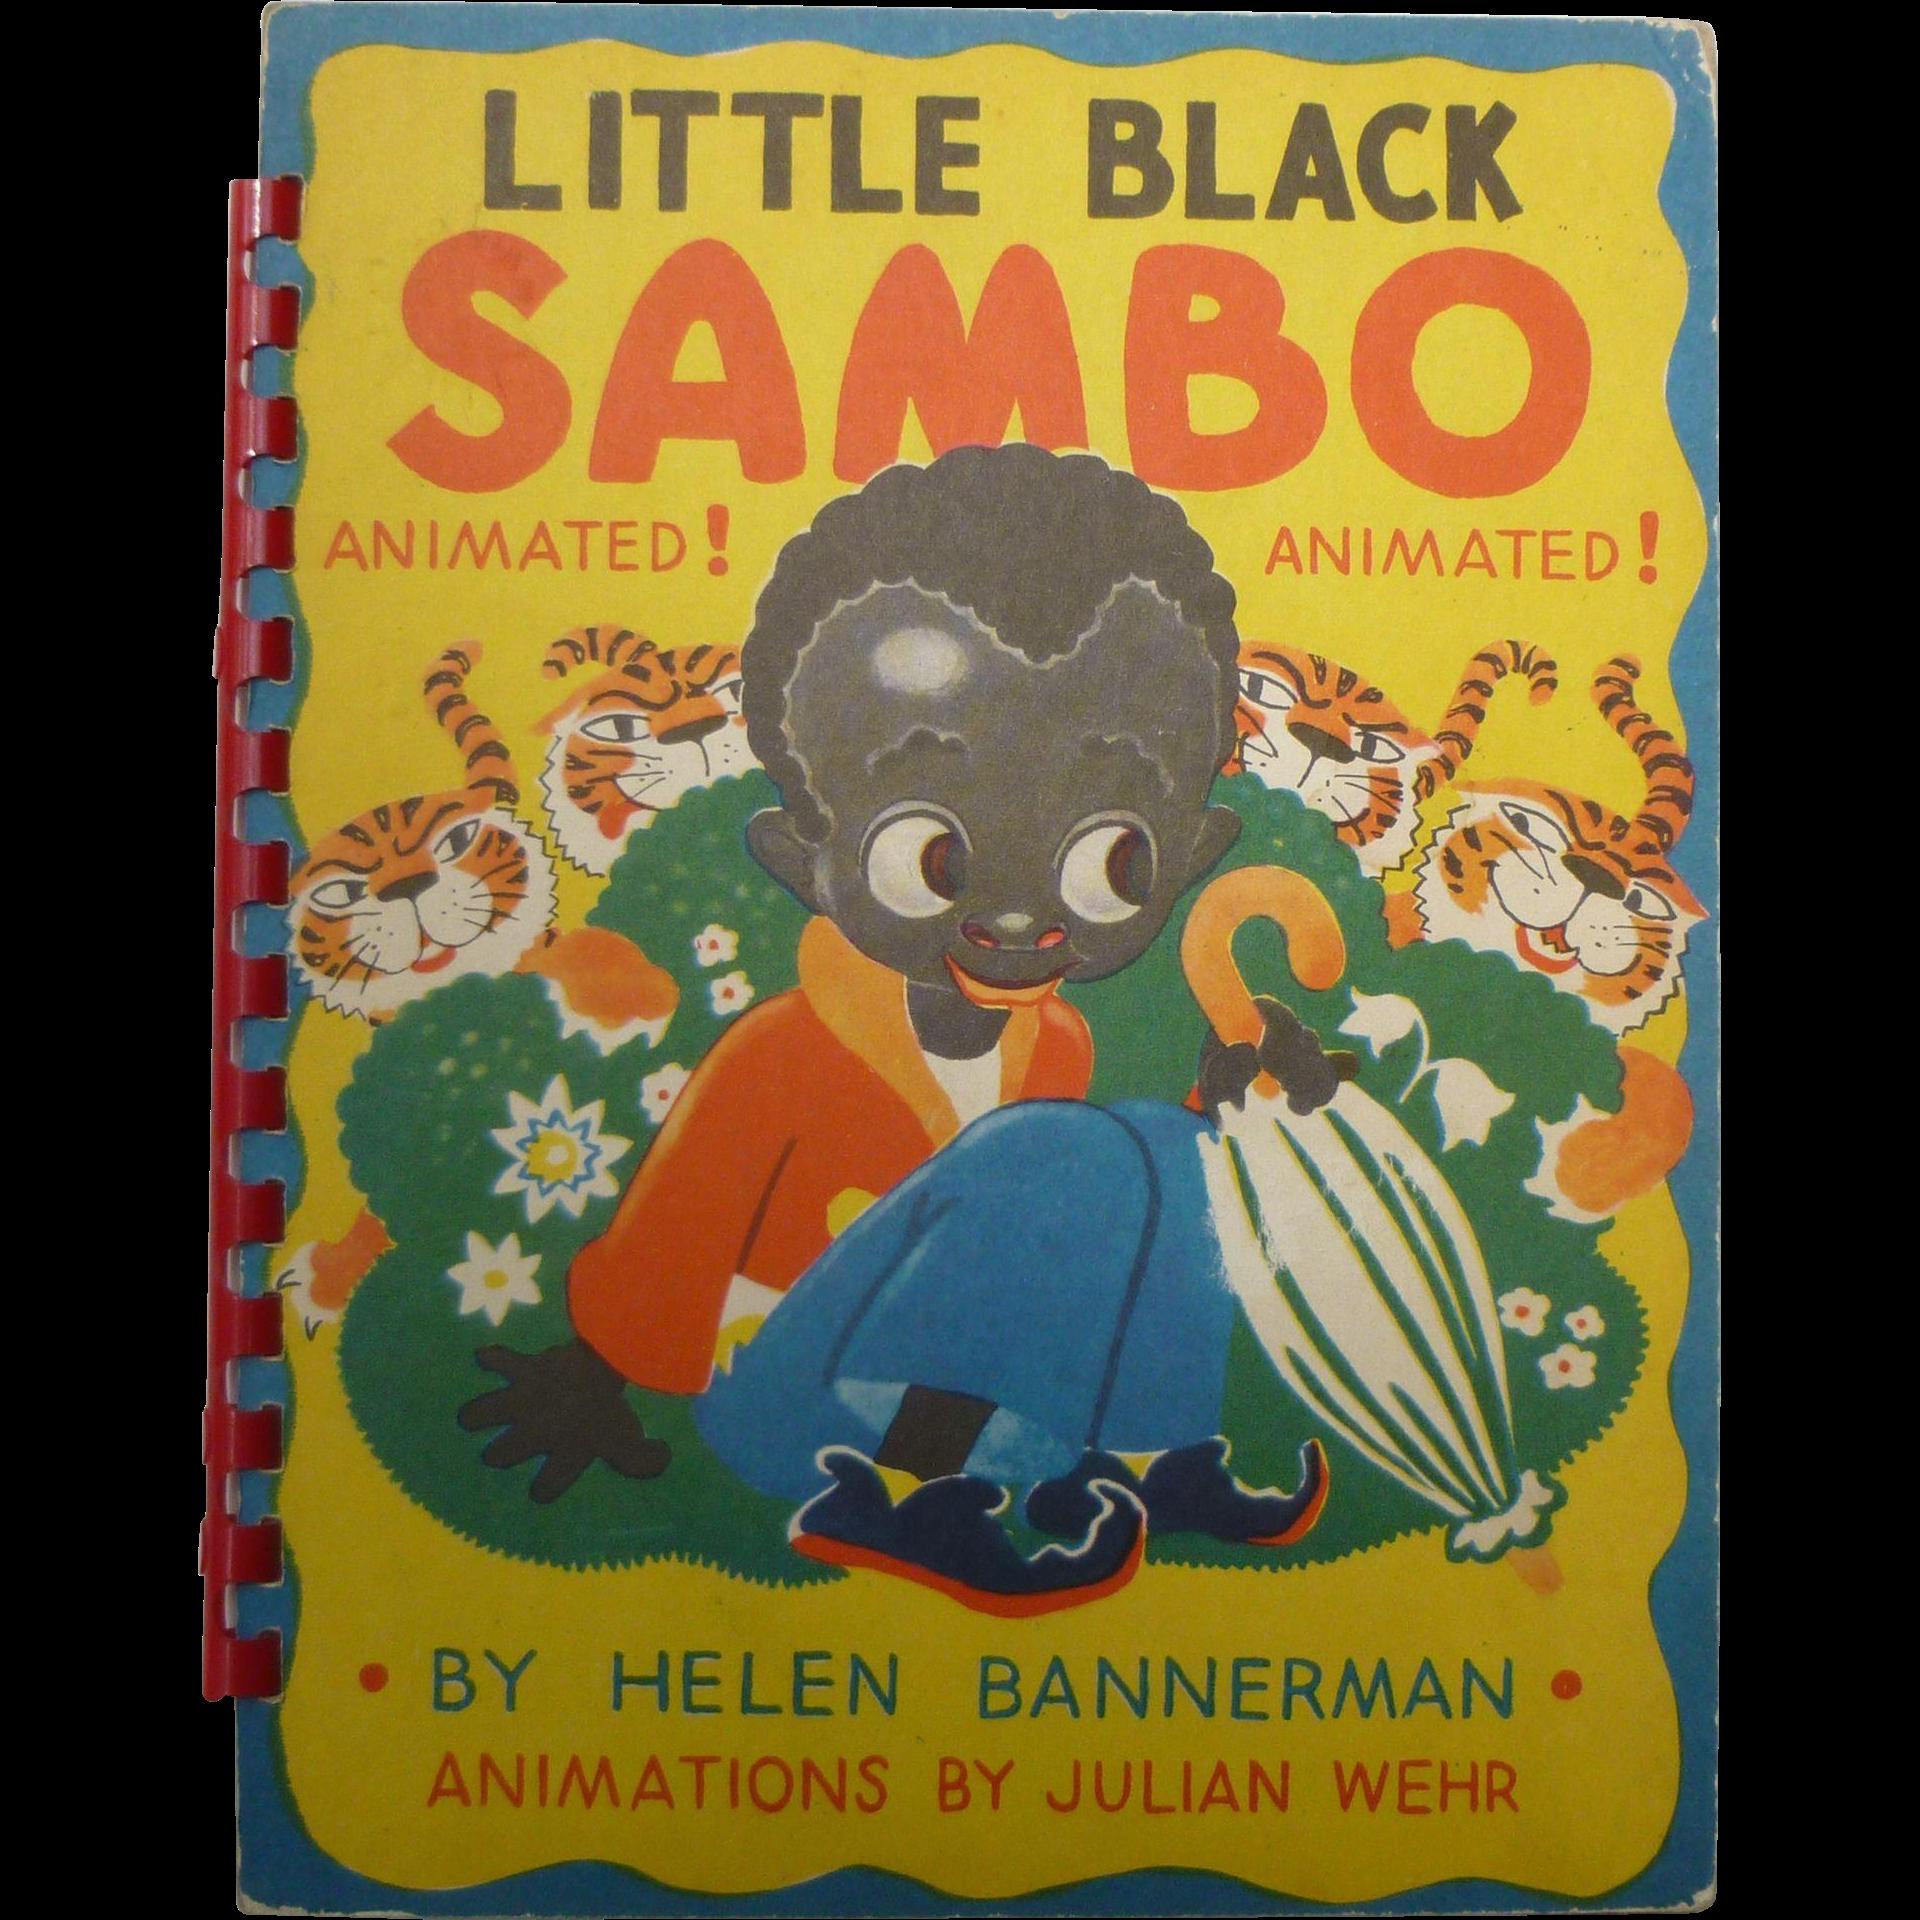 Julian Wehr Animated Little Black Sambo Children's Book